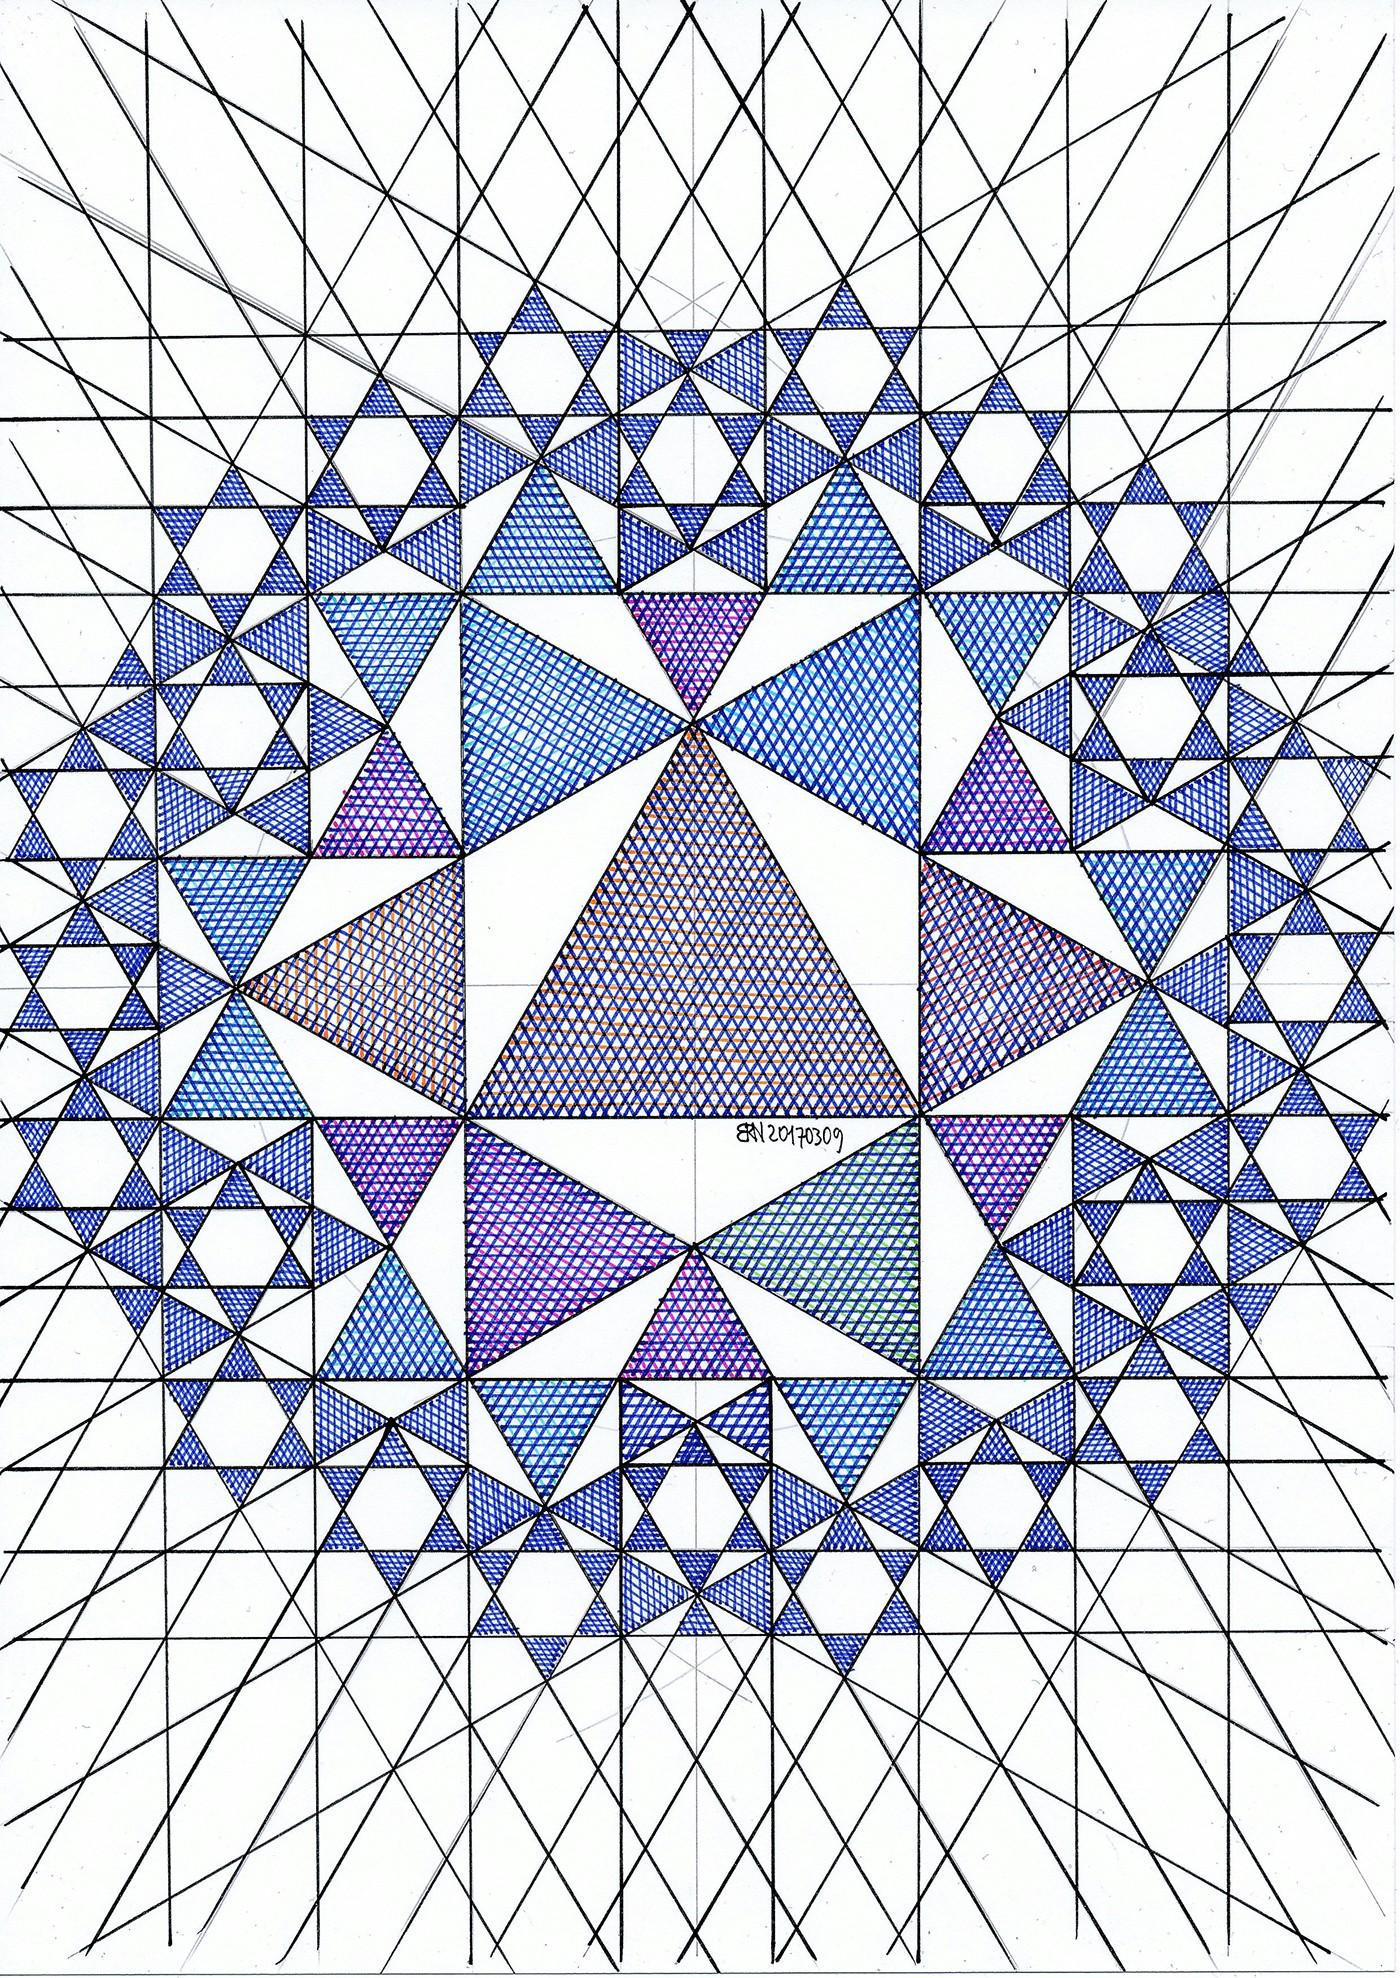 10 geometric art explorations for math learning - 736×1039